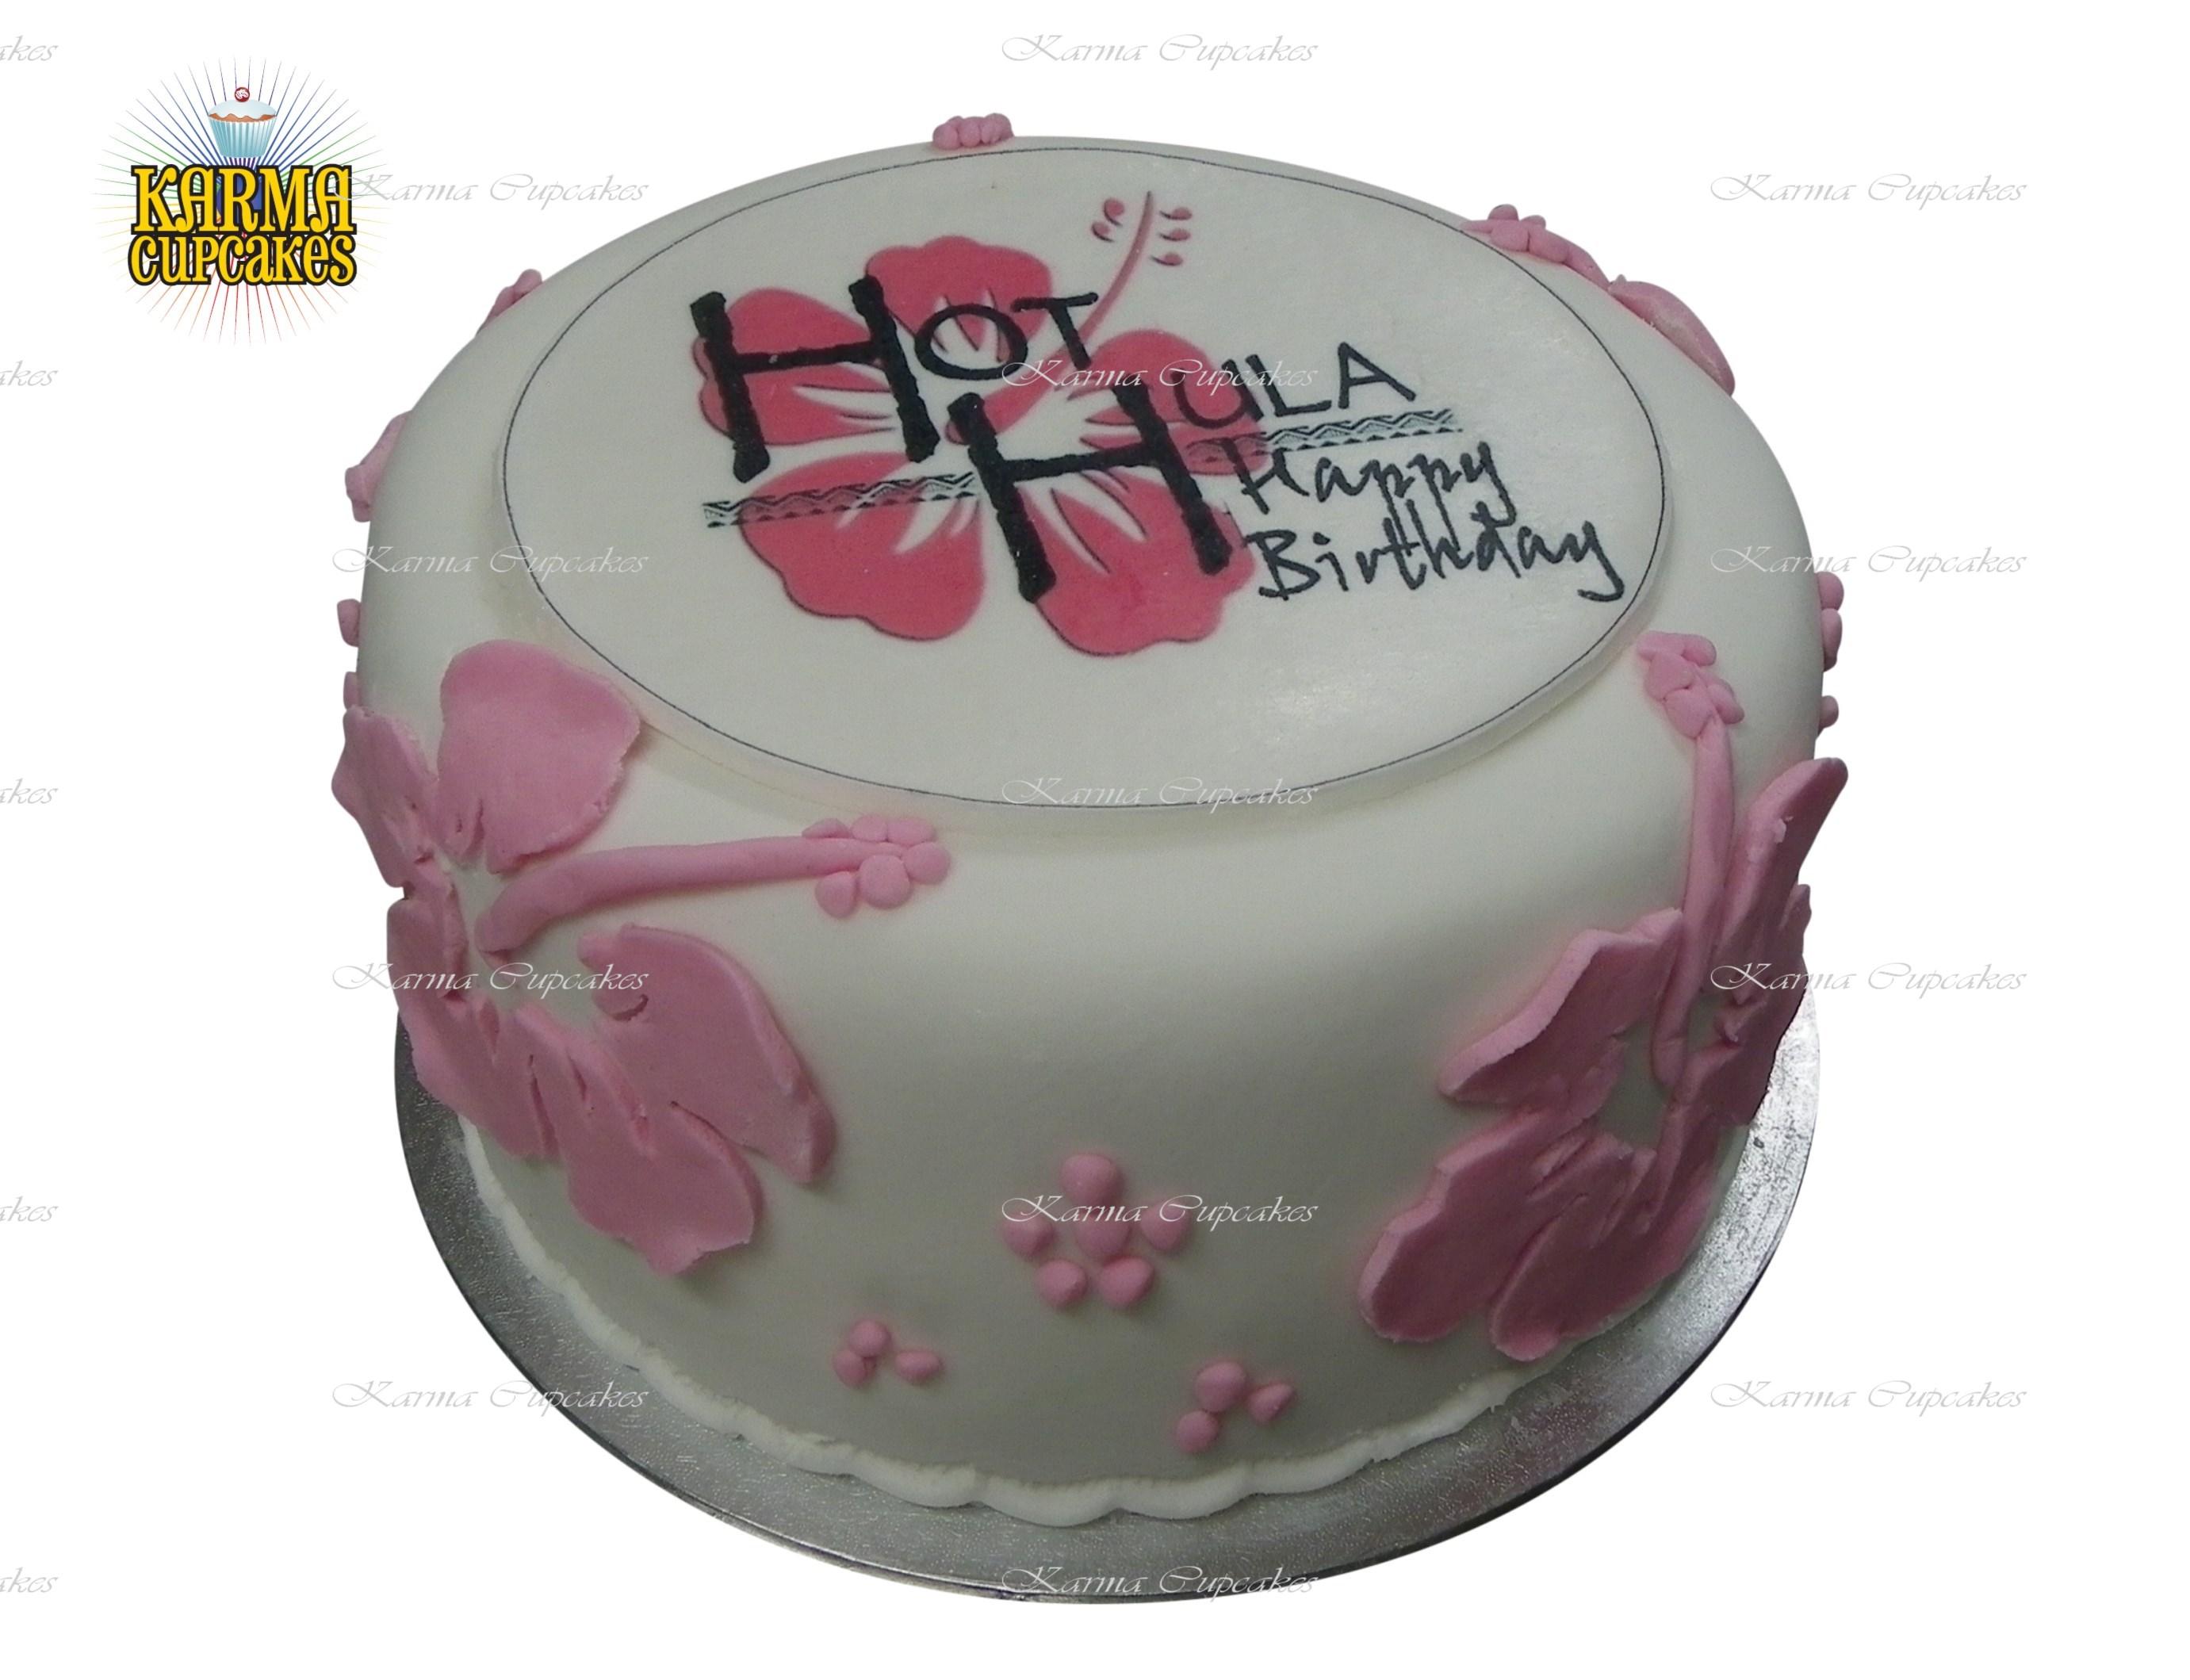 "8"" Hawaiian Themed Cake with Edible Image"